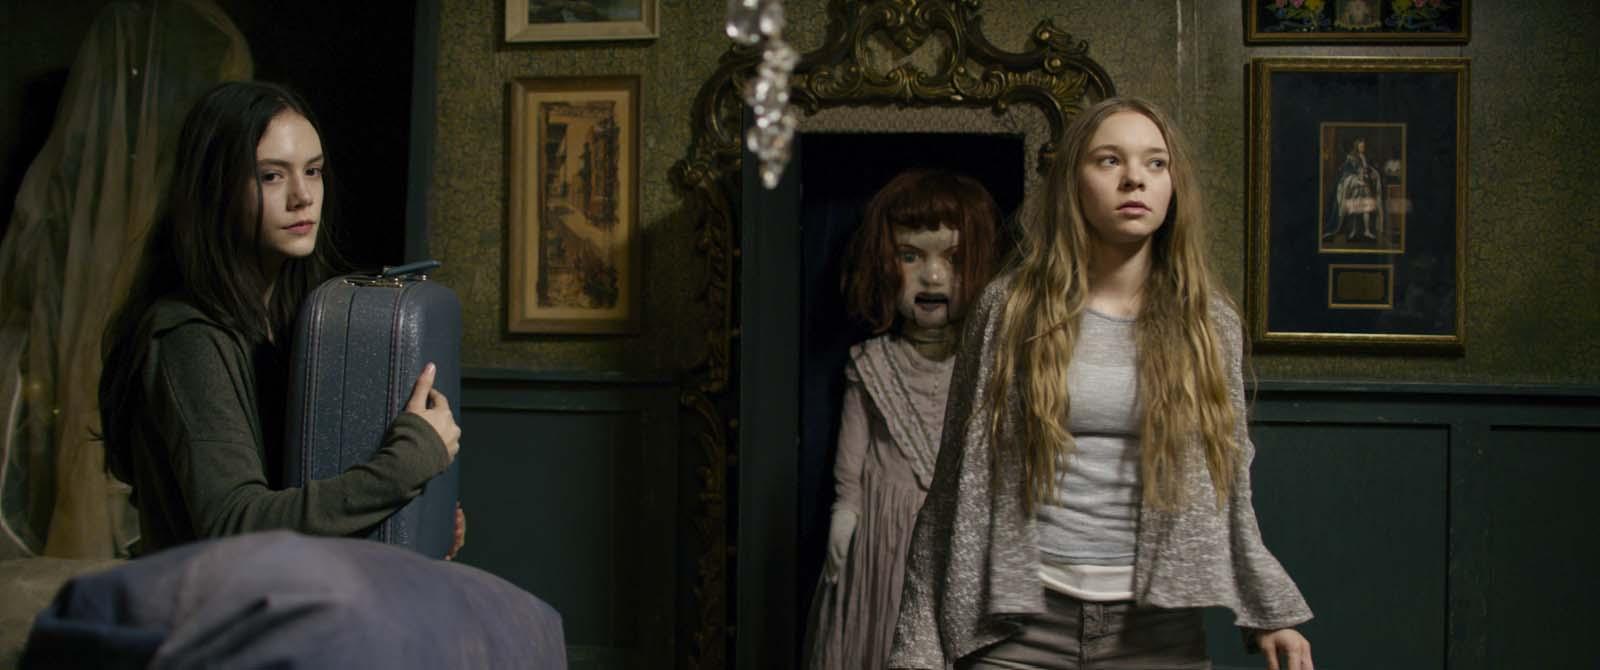 ghostland critique film avis Photo Emilia Jones, Taylor Hickson